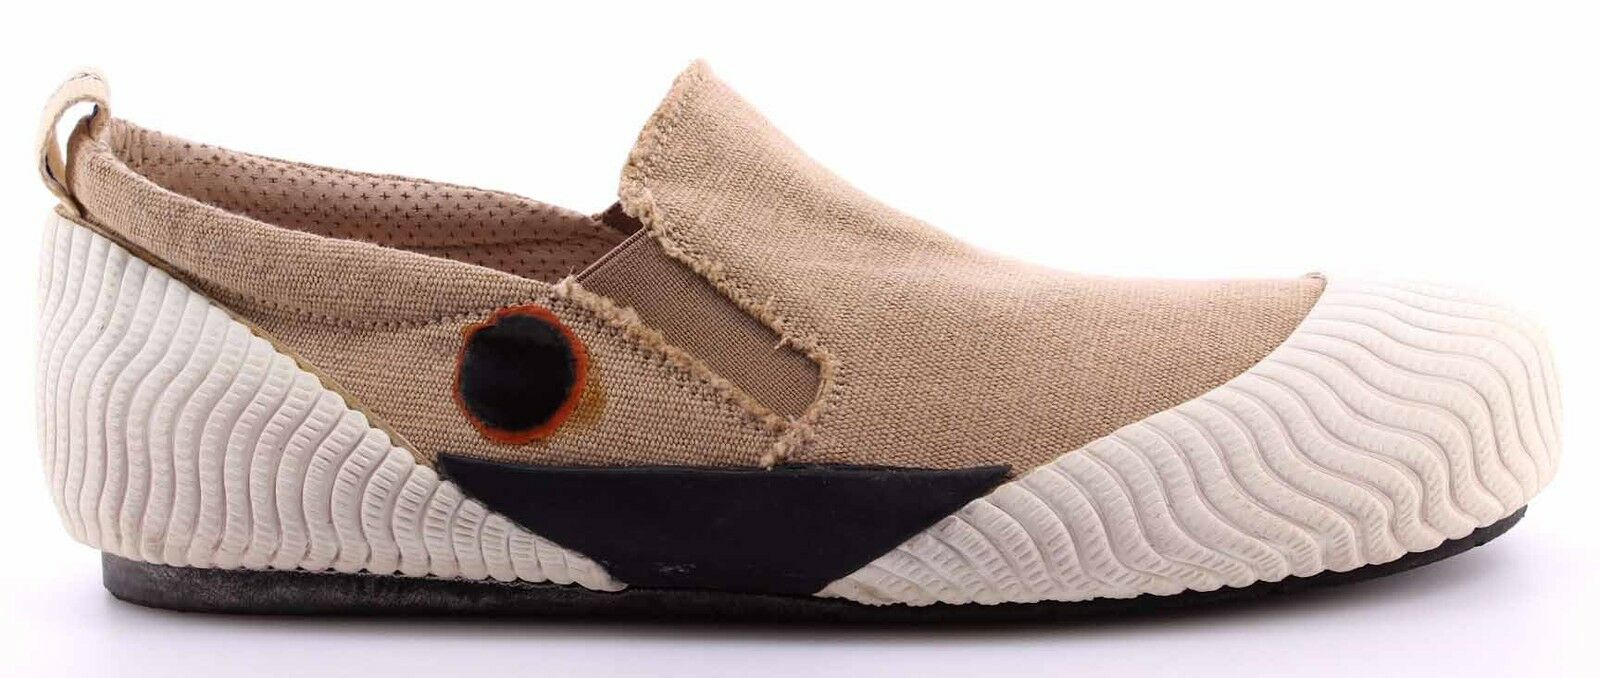 Herren Sneakers Schuhe MOMA 13502-VX Softy WEISS Slip On Beige Vintage  Neu